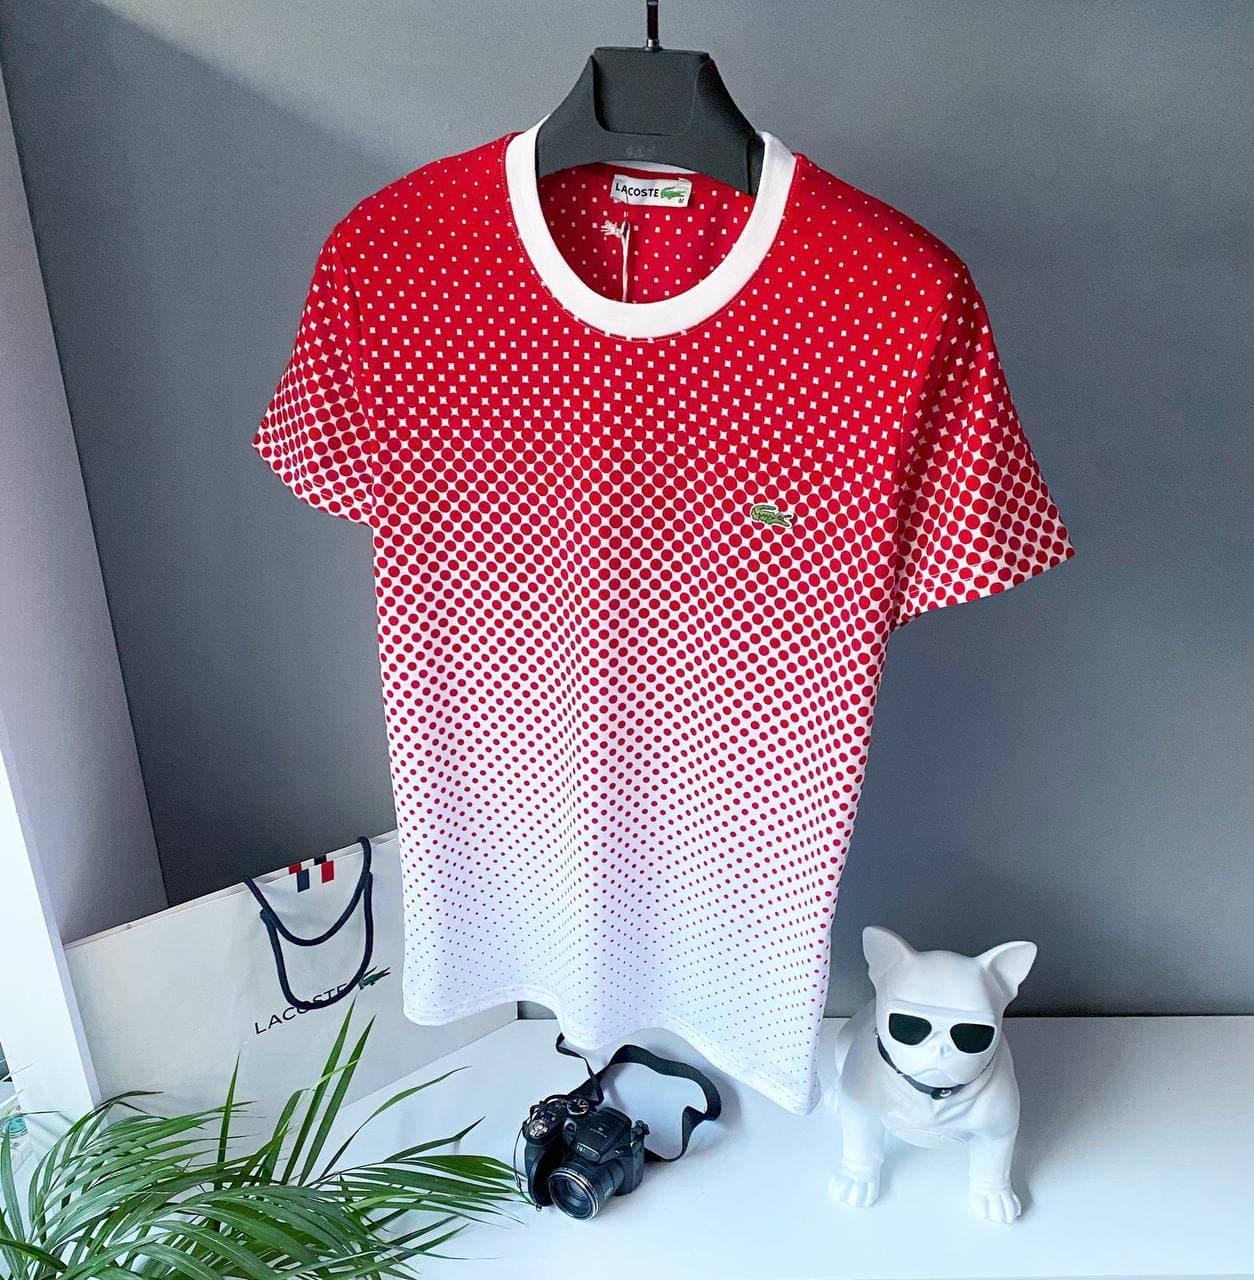 Мужская футболка Lacoste красного цвета